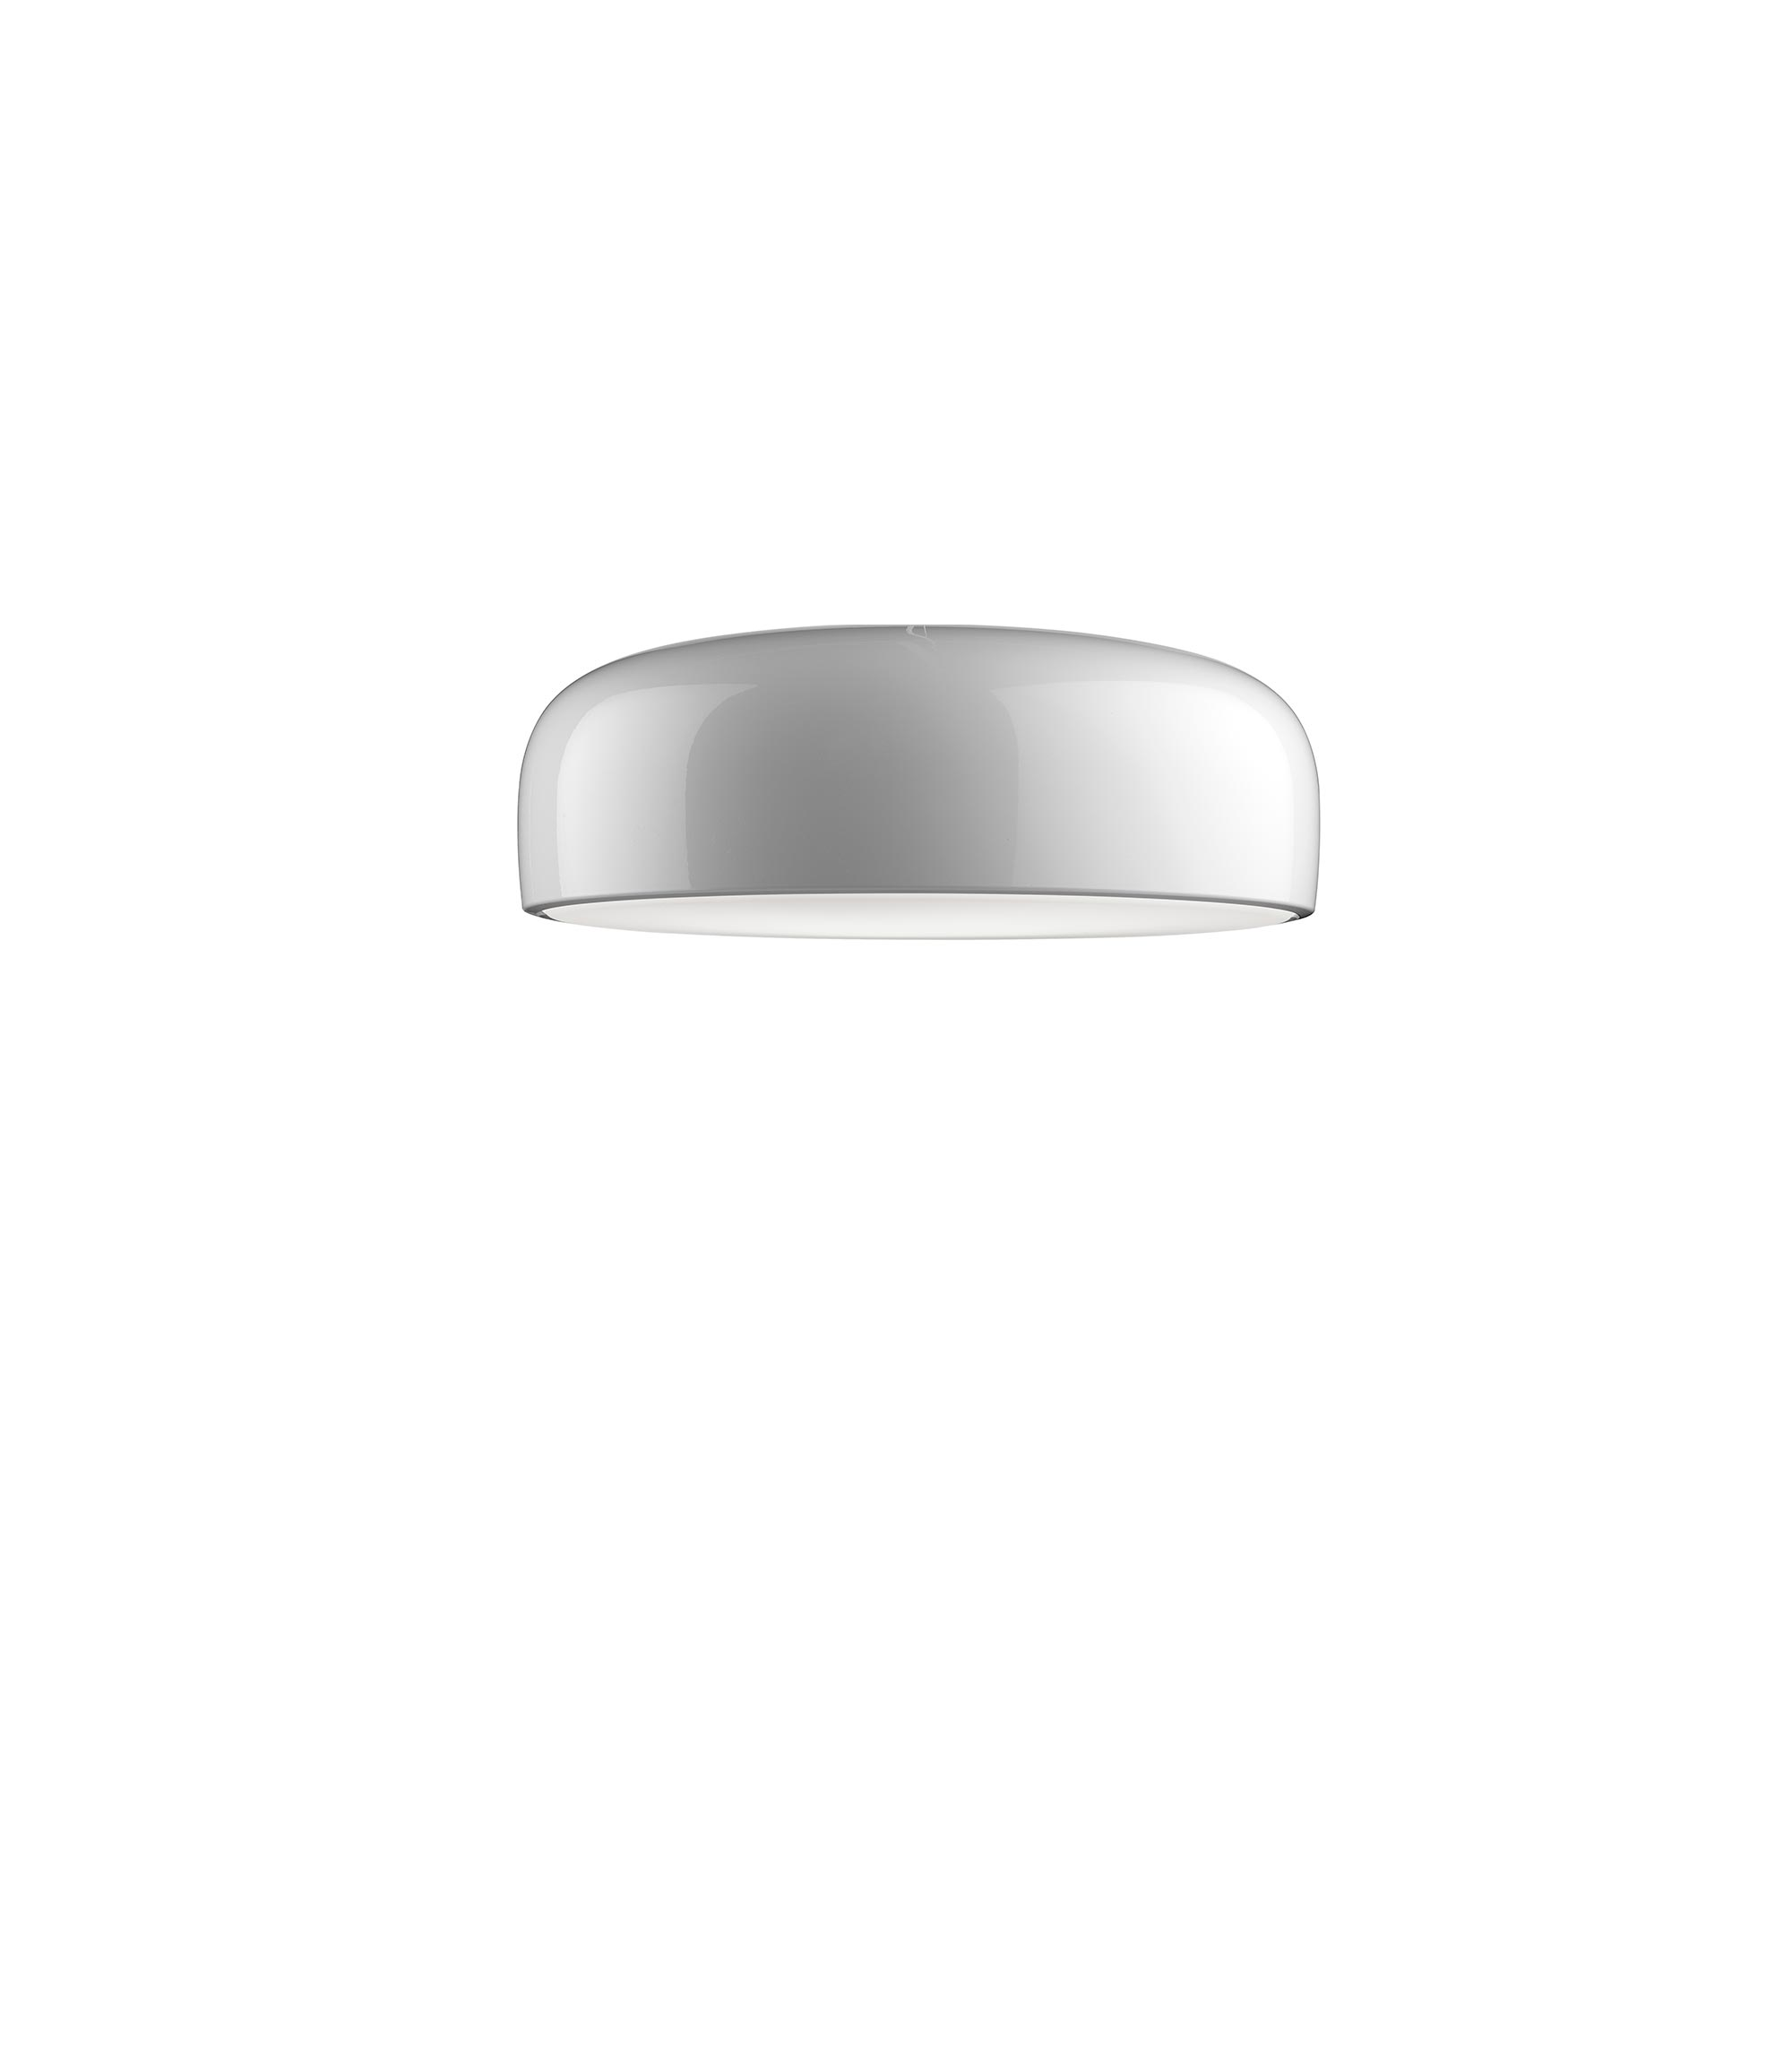 Smithfield ceiling morrison led flos F1366009 product still life big